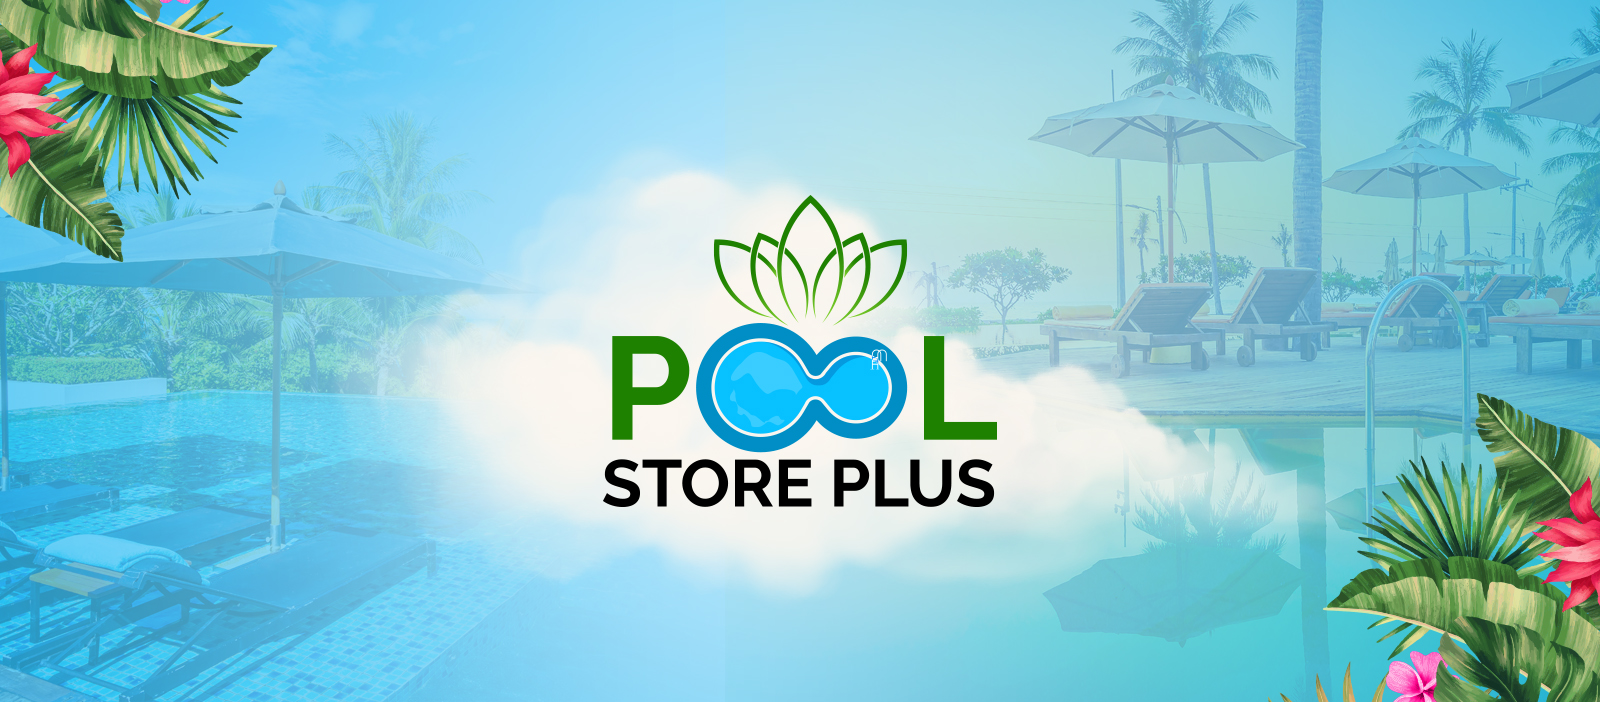 Pool Shop & Pool Services